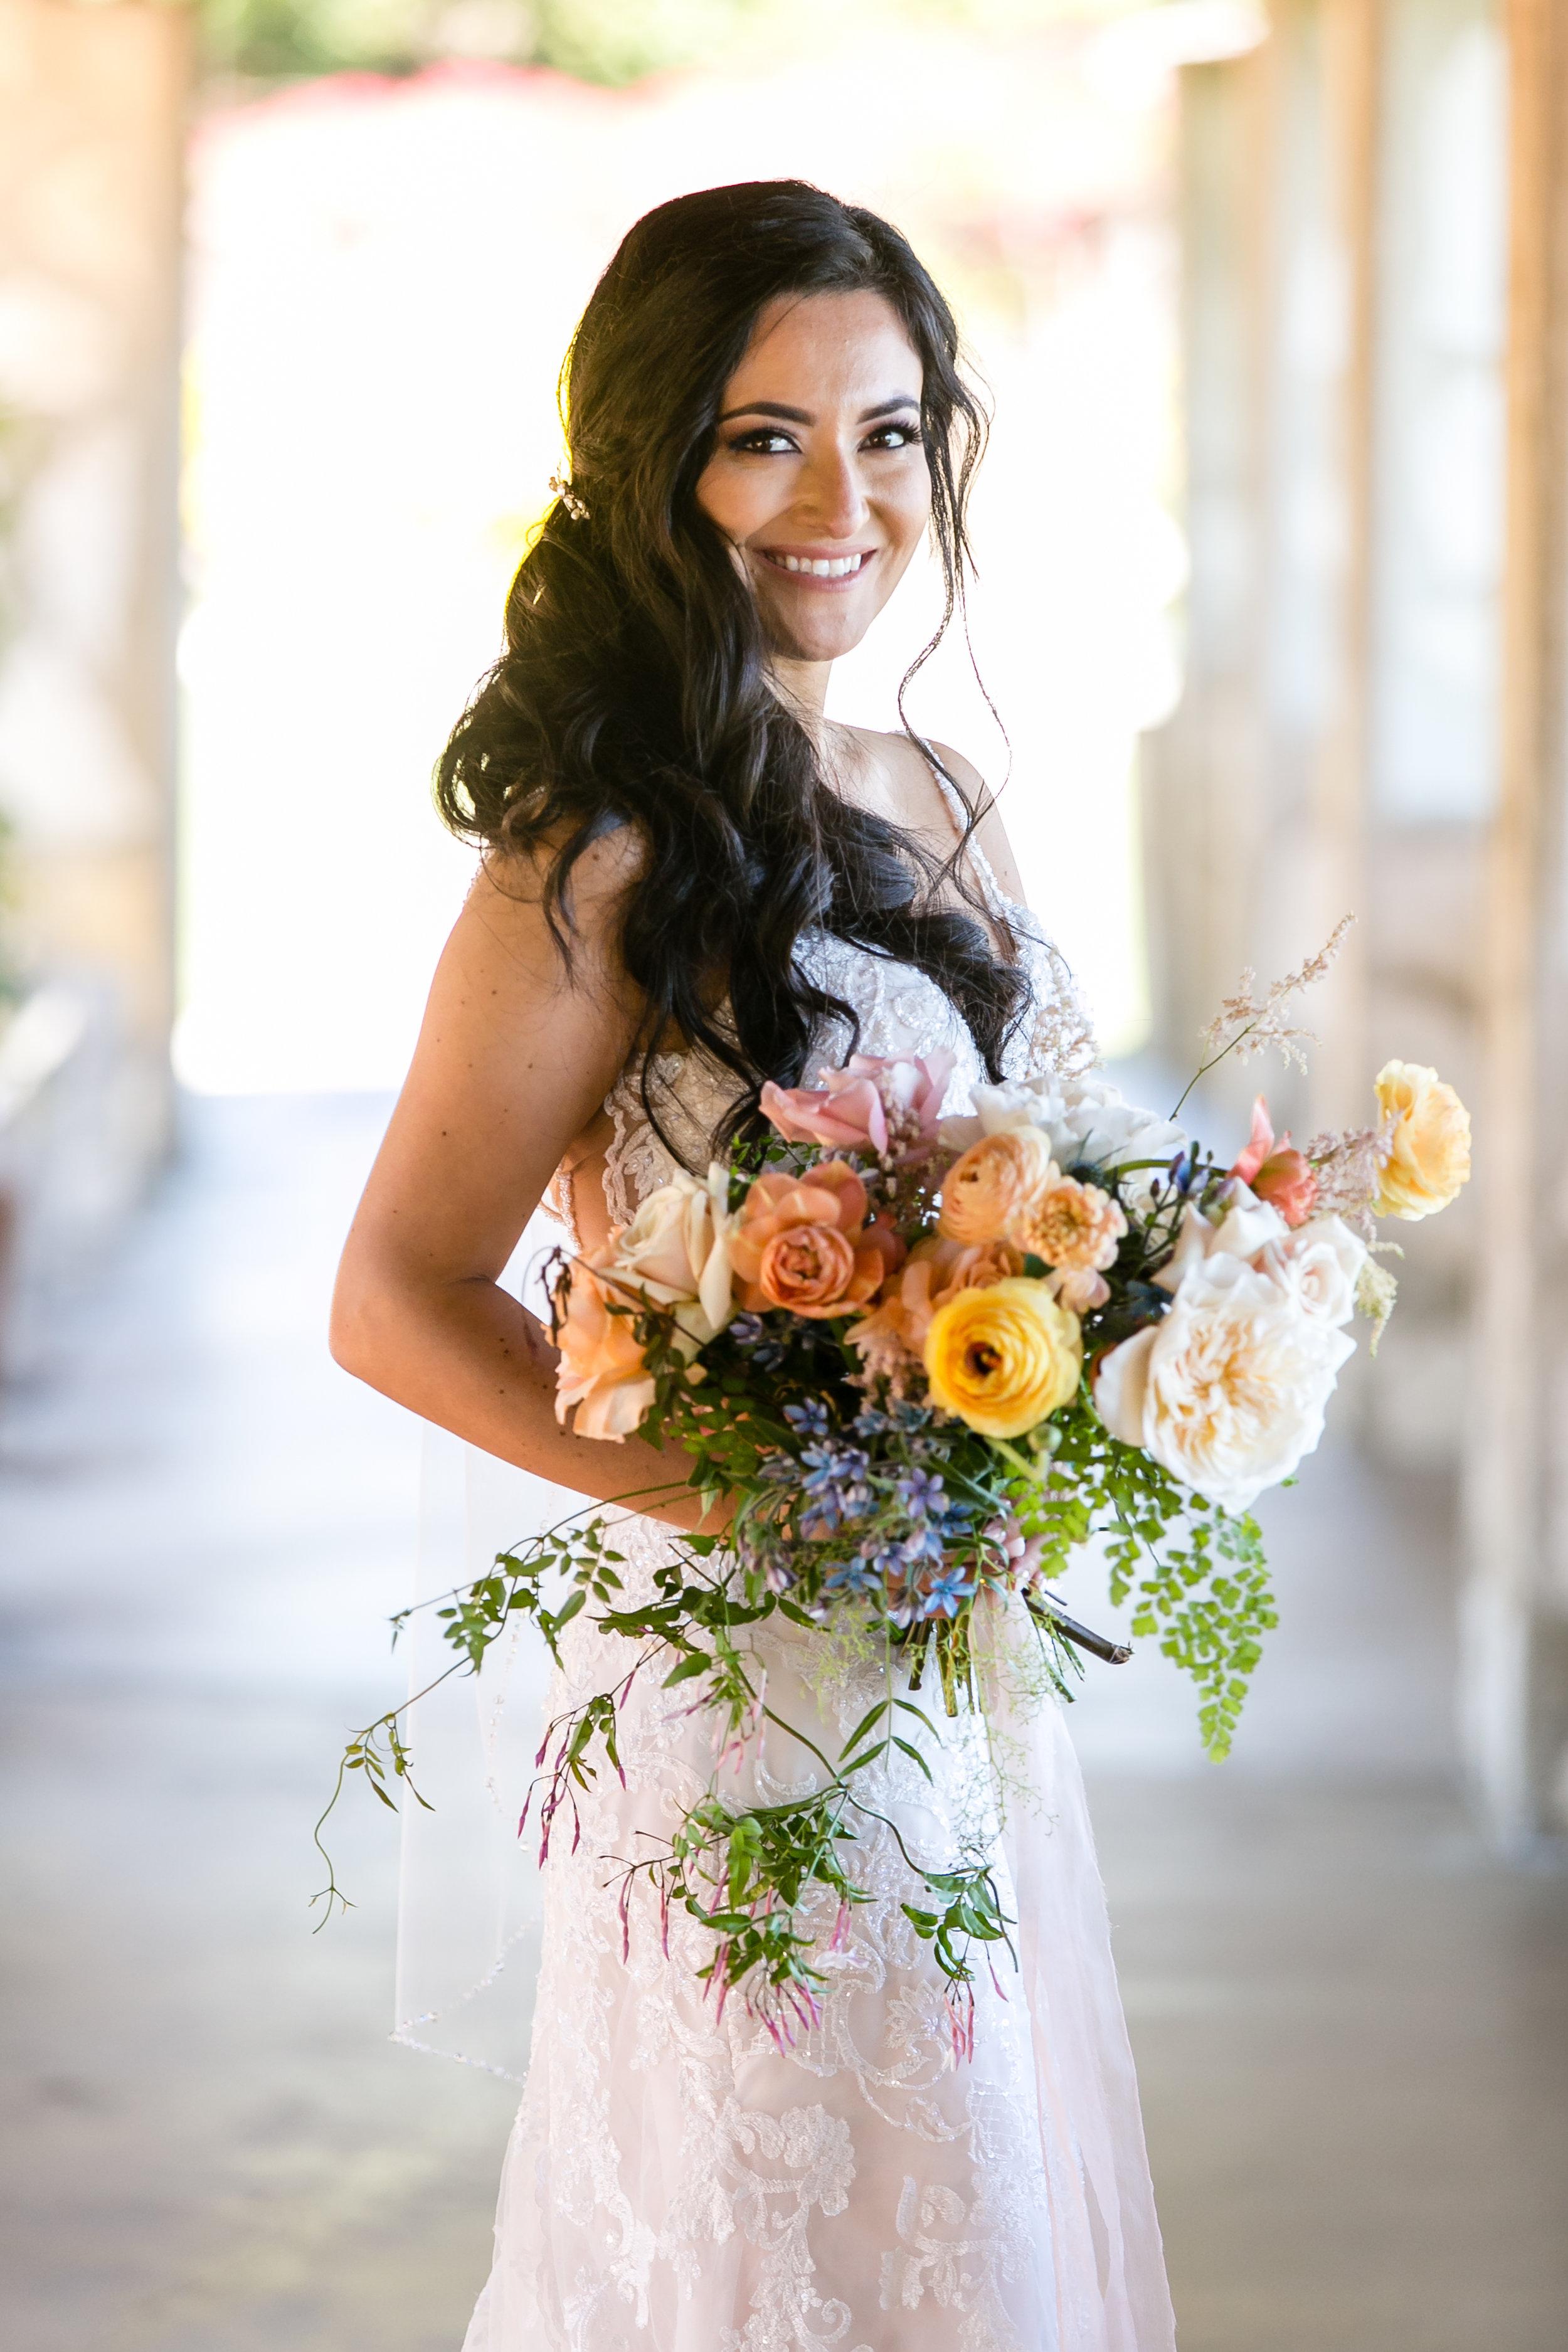 2019_05_24_Wedding_Barajas_0387.jpg